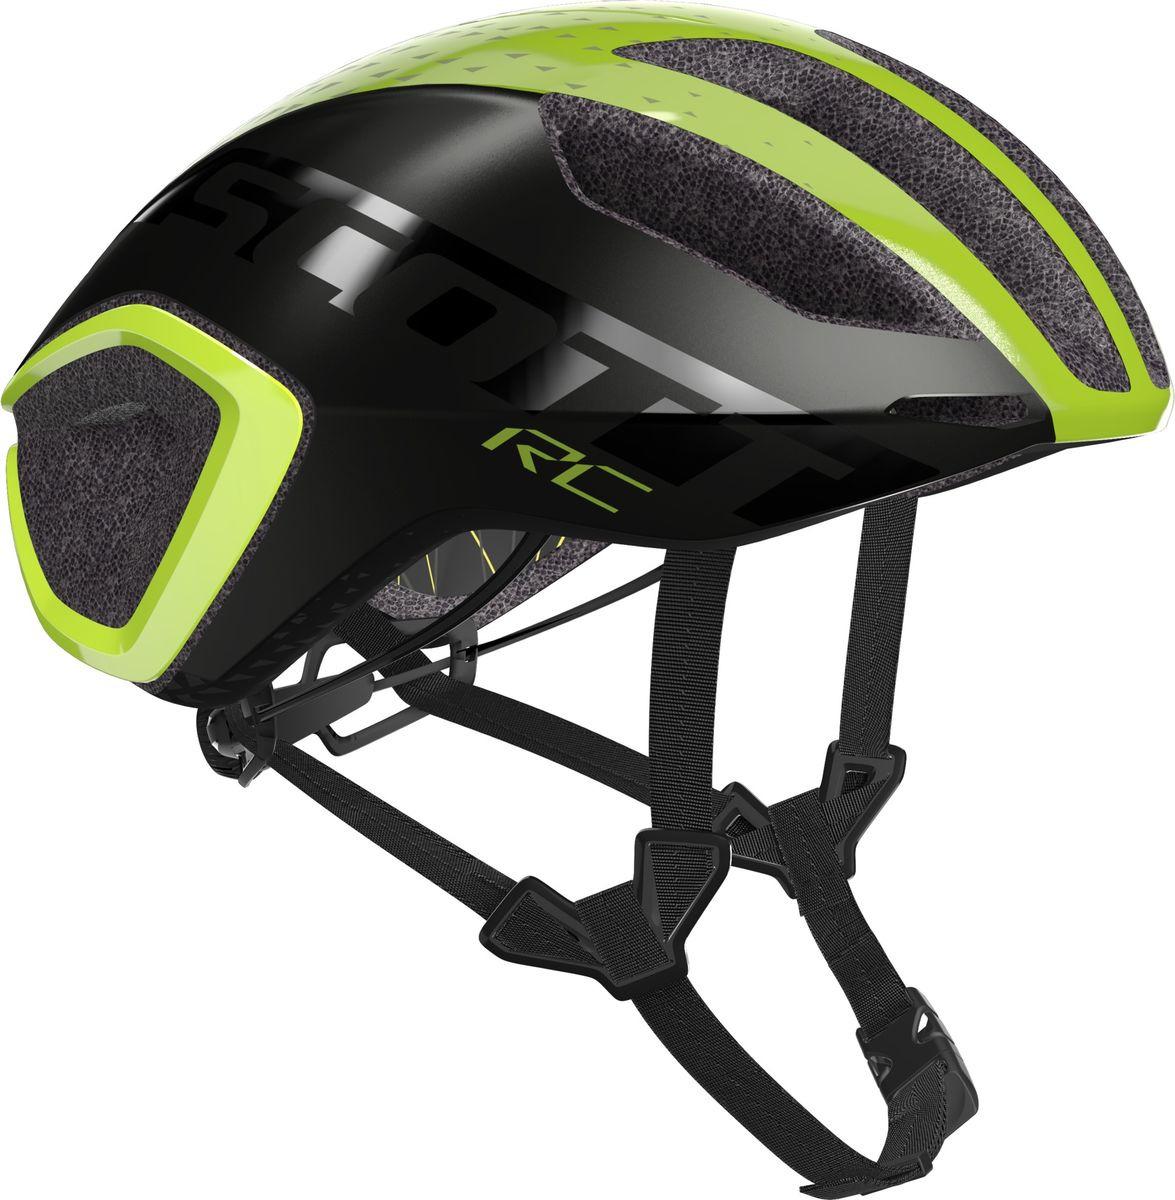 Шлем защитный Scott Cadence Plus, 250026-6176, желтый, размер M (55/59) scott moeller intelligent m